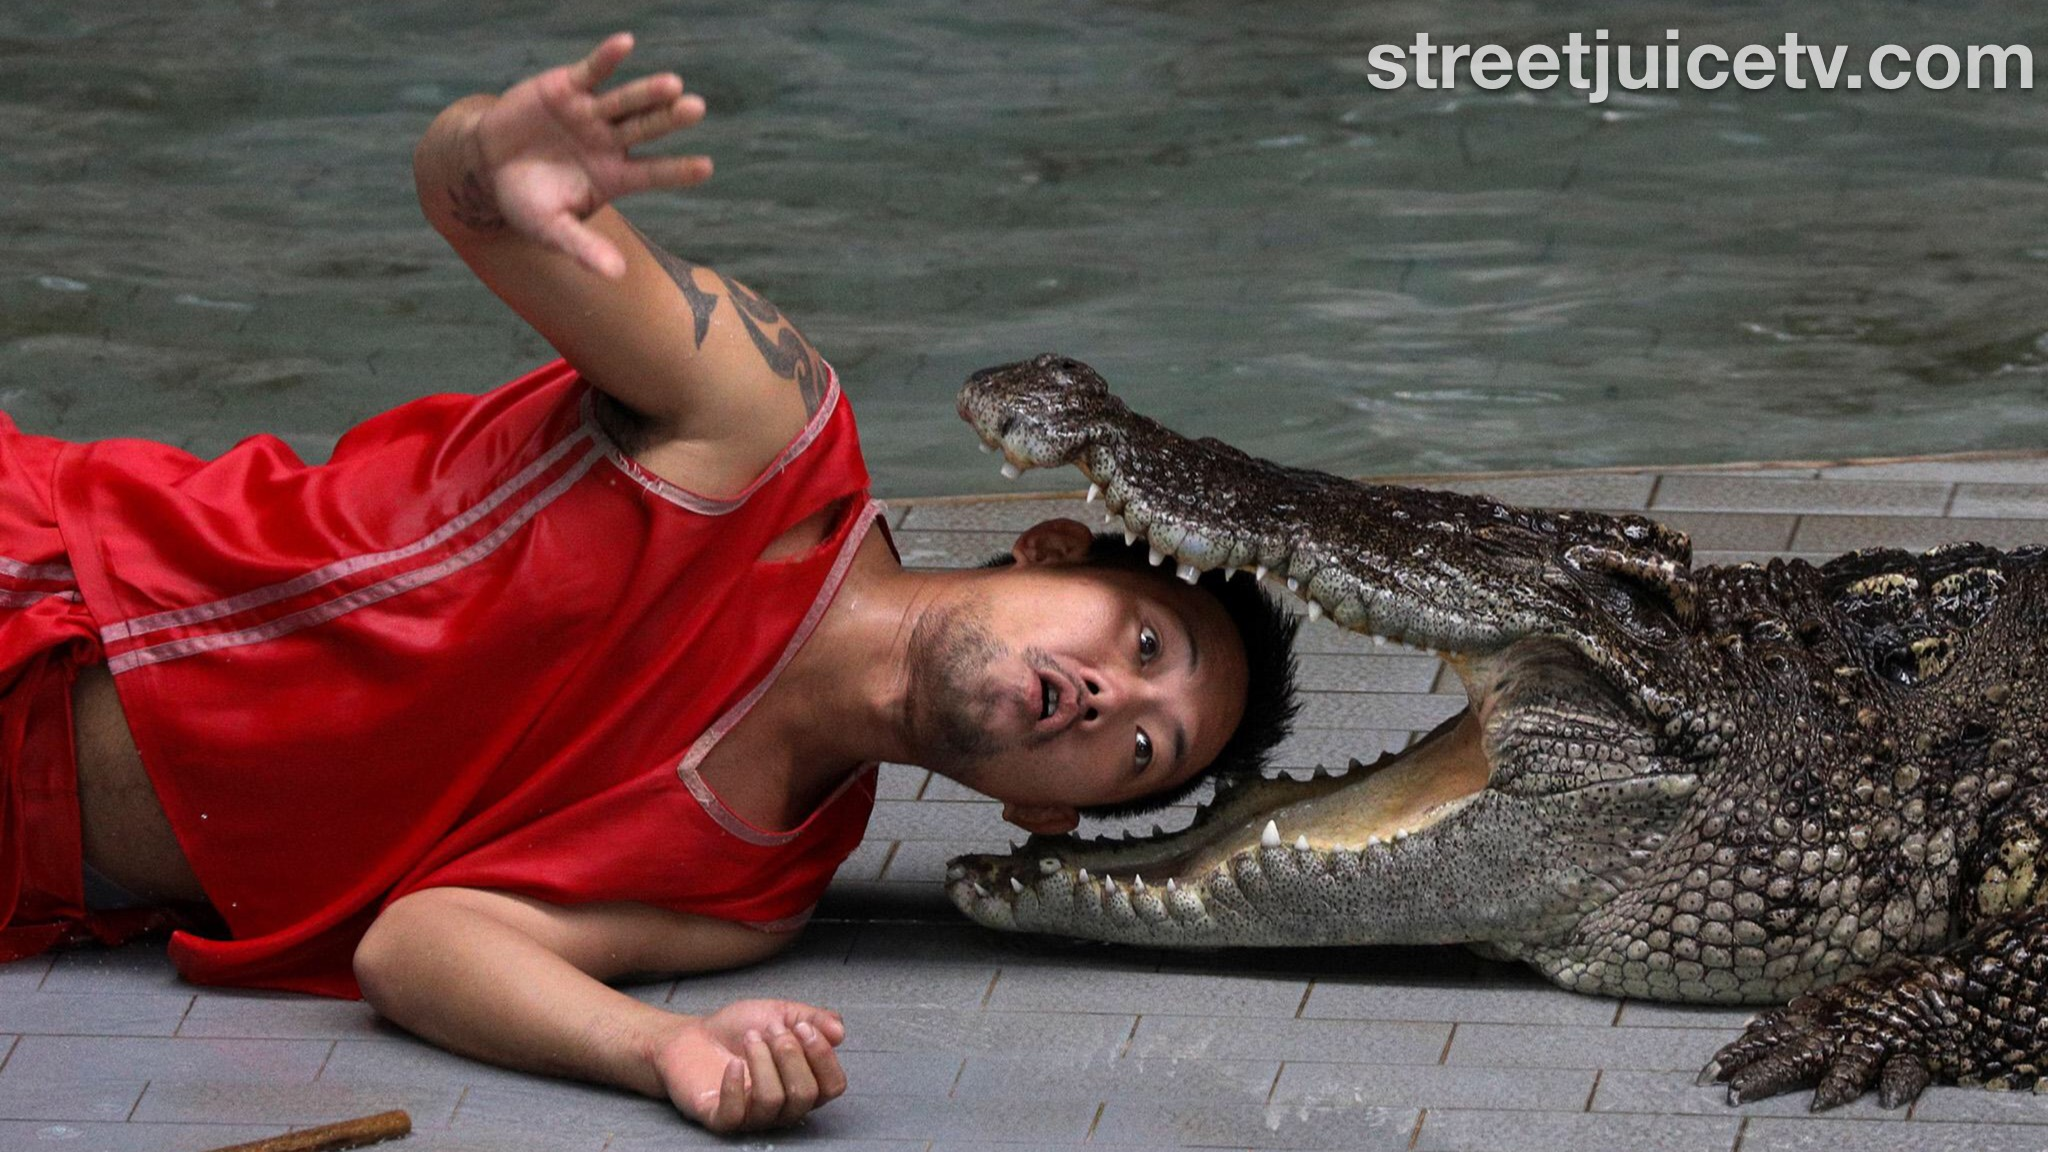 53 Year Old South Carolina Women Eaten By Alligator